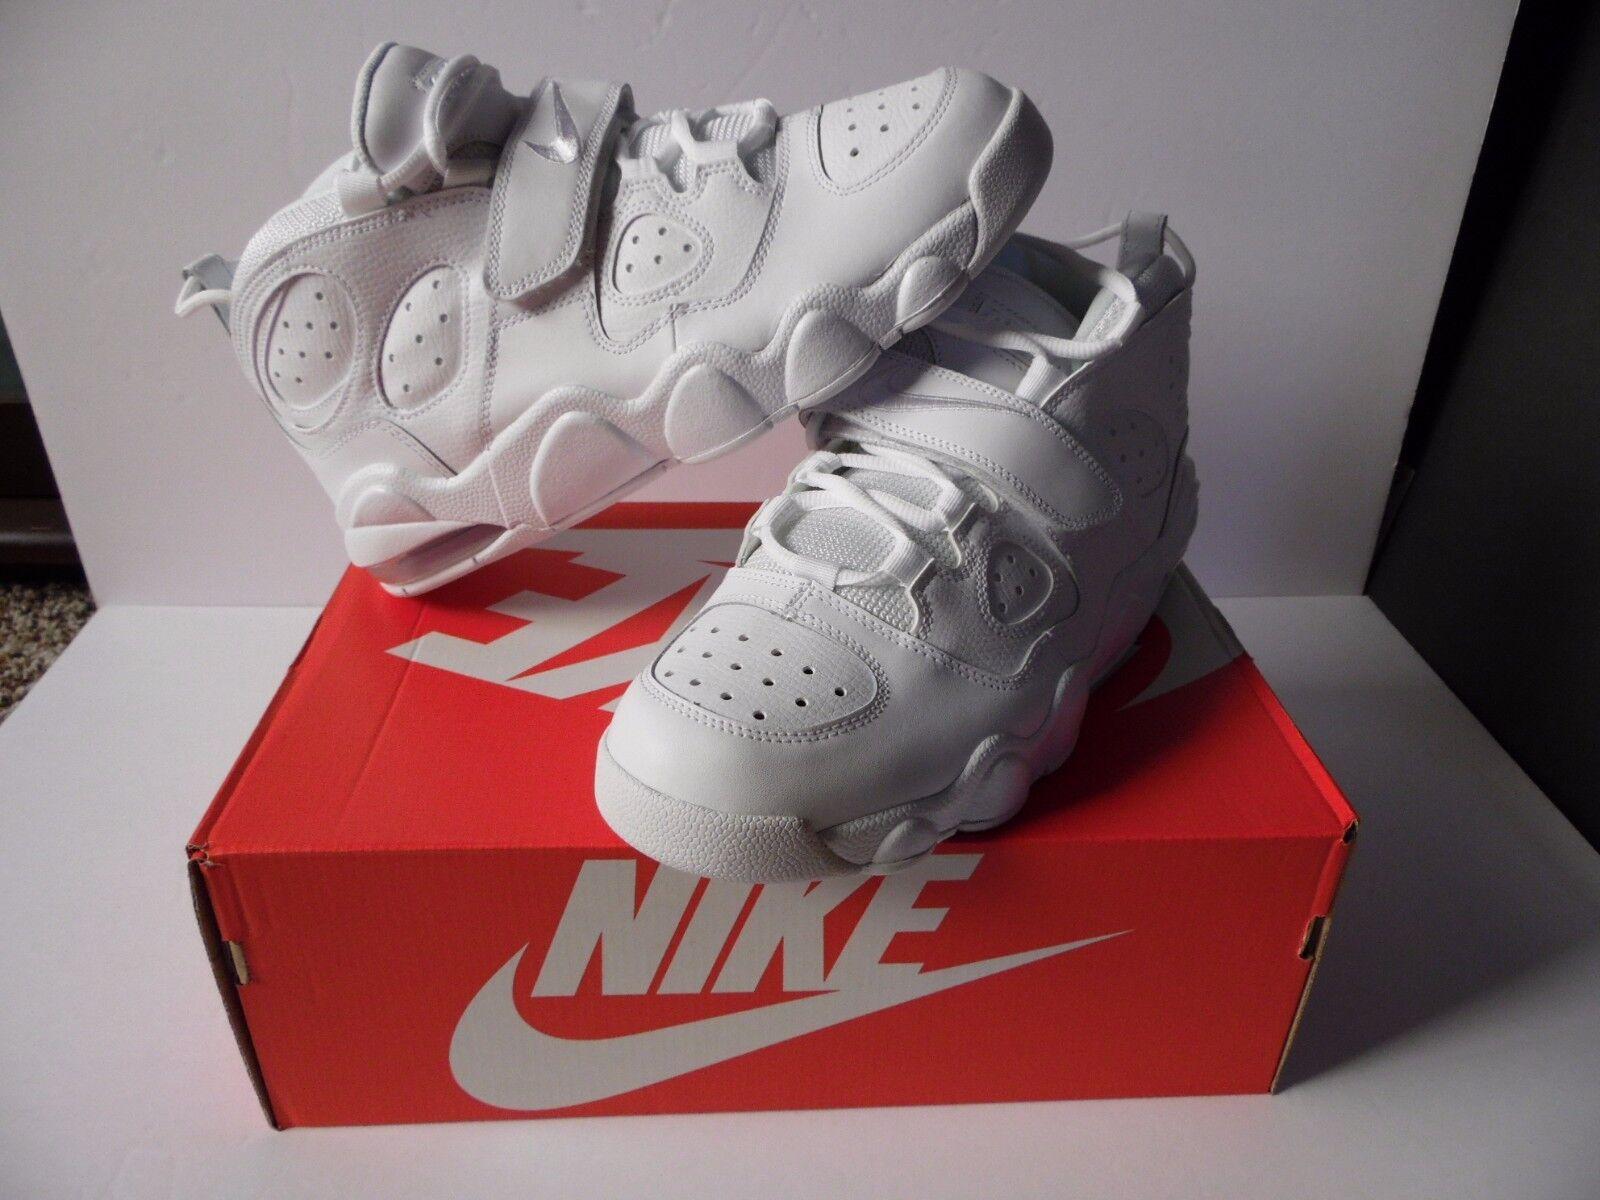 Nike Air Max CB 34 10.5 Charles Barkley Godzilla Men's 10.5 34   316940-100 68545a